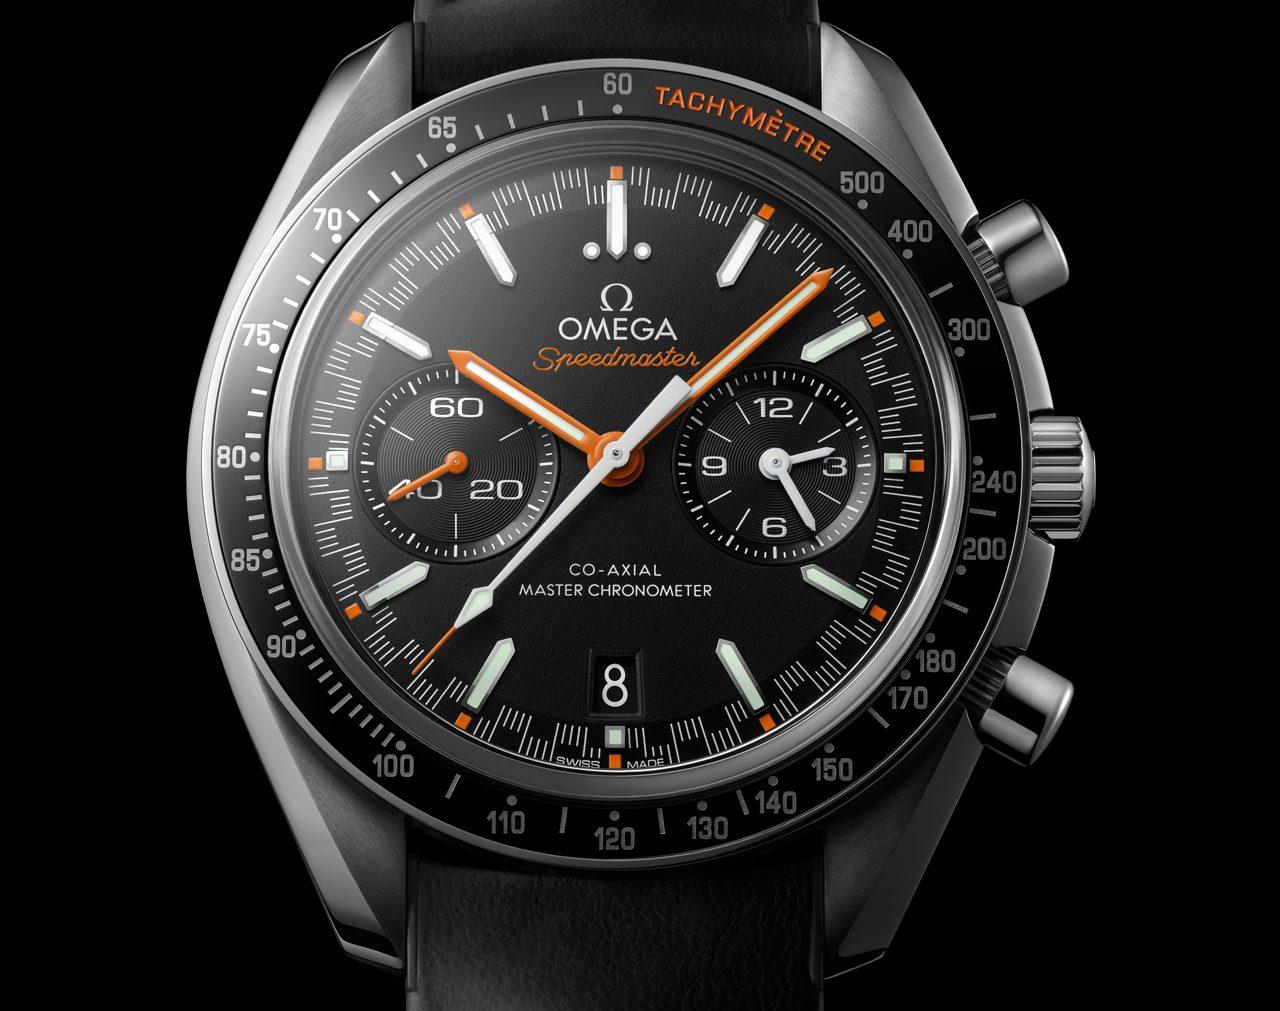 anteprima-baselworld-2017-omega-speedmaster-automatic-prezzo-price_0-1003